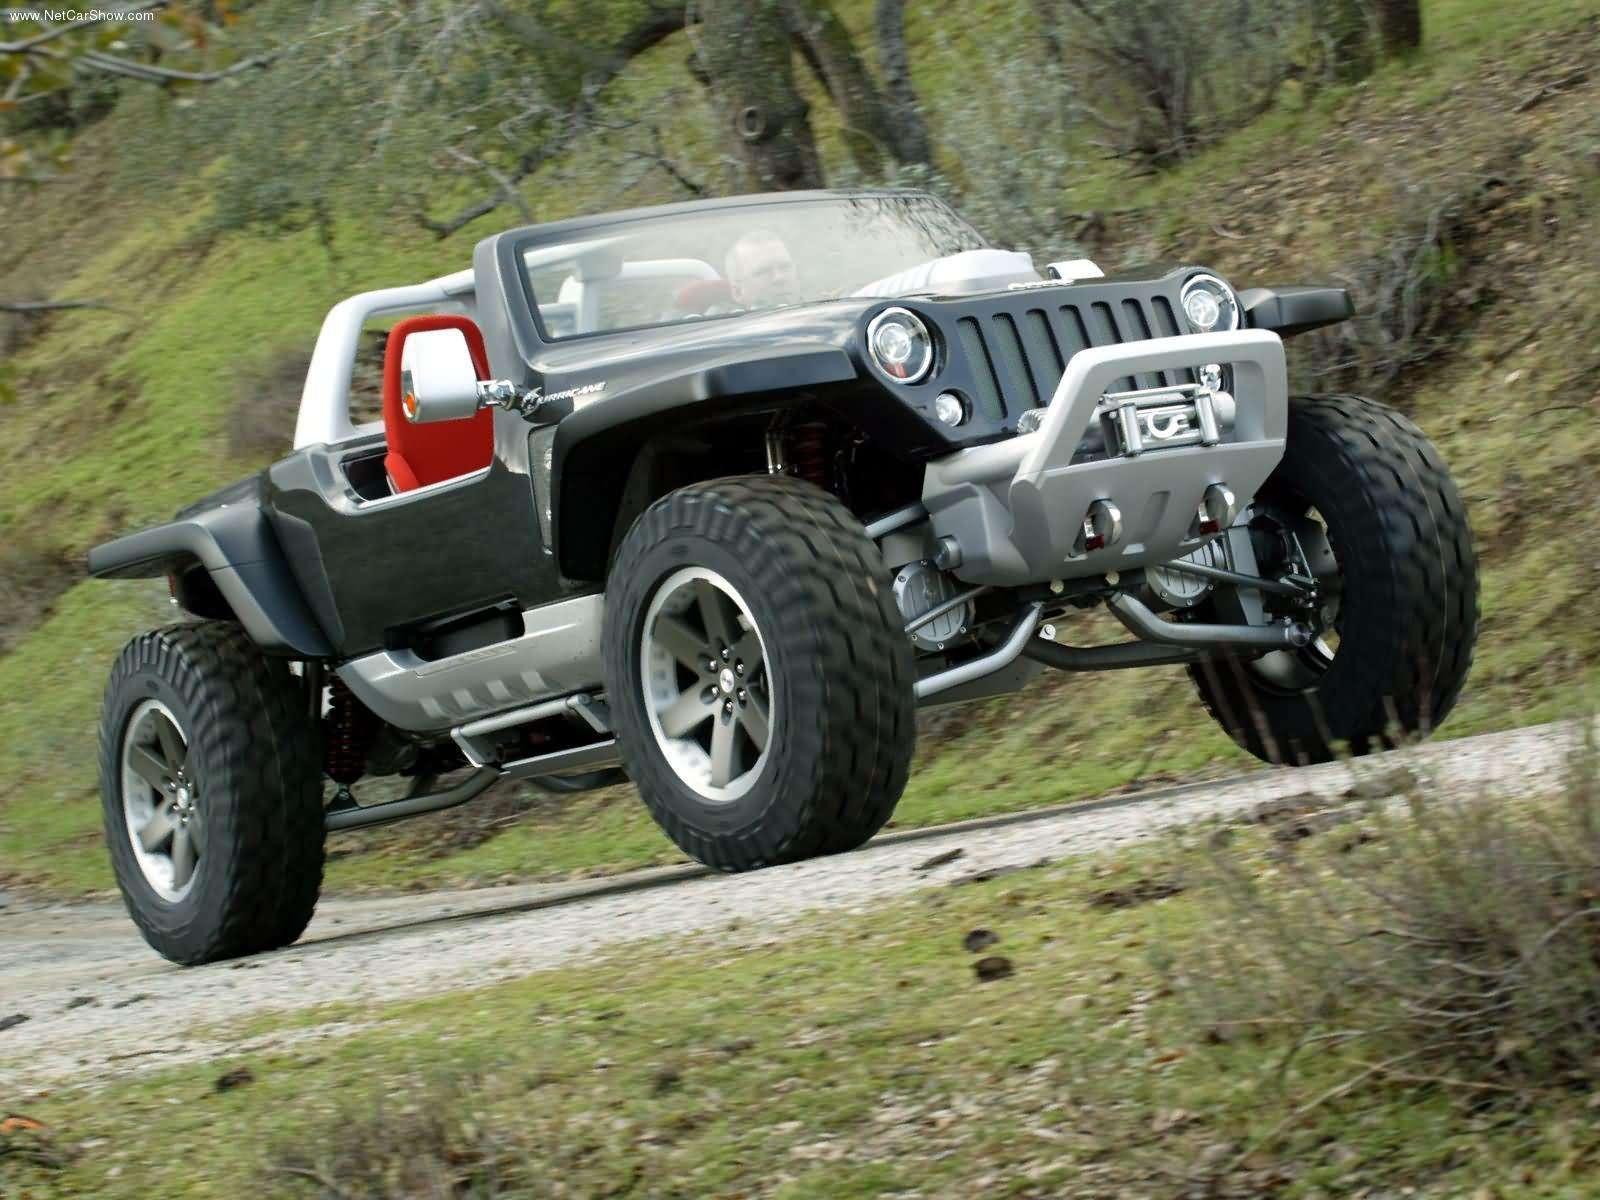 Jeep-Hurricane_Concept-2005-1600-01.jpg